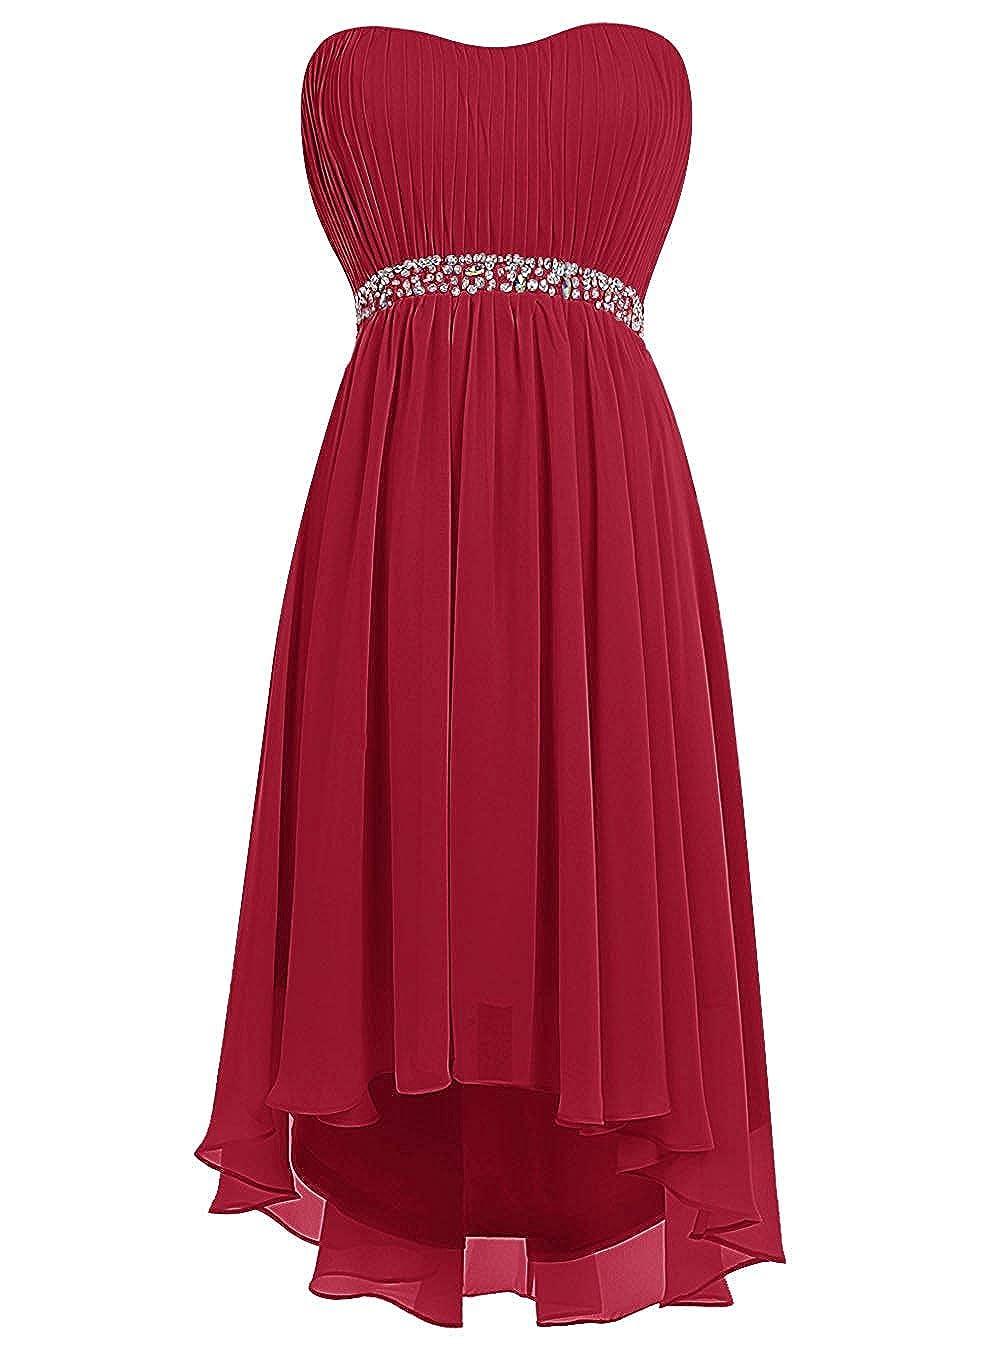 Womens Chiffon Bridesmaid Dress Short Homecoming Prom Dresses